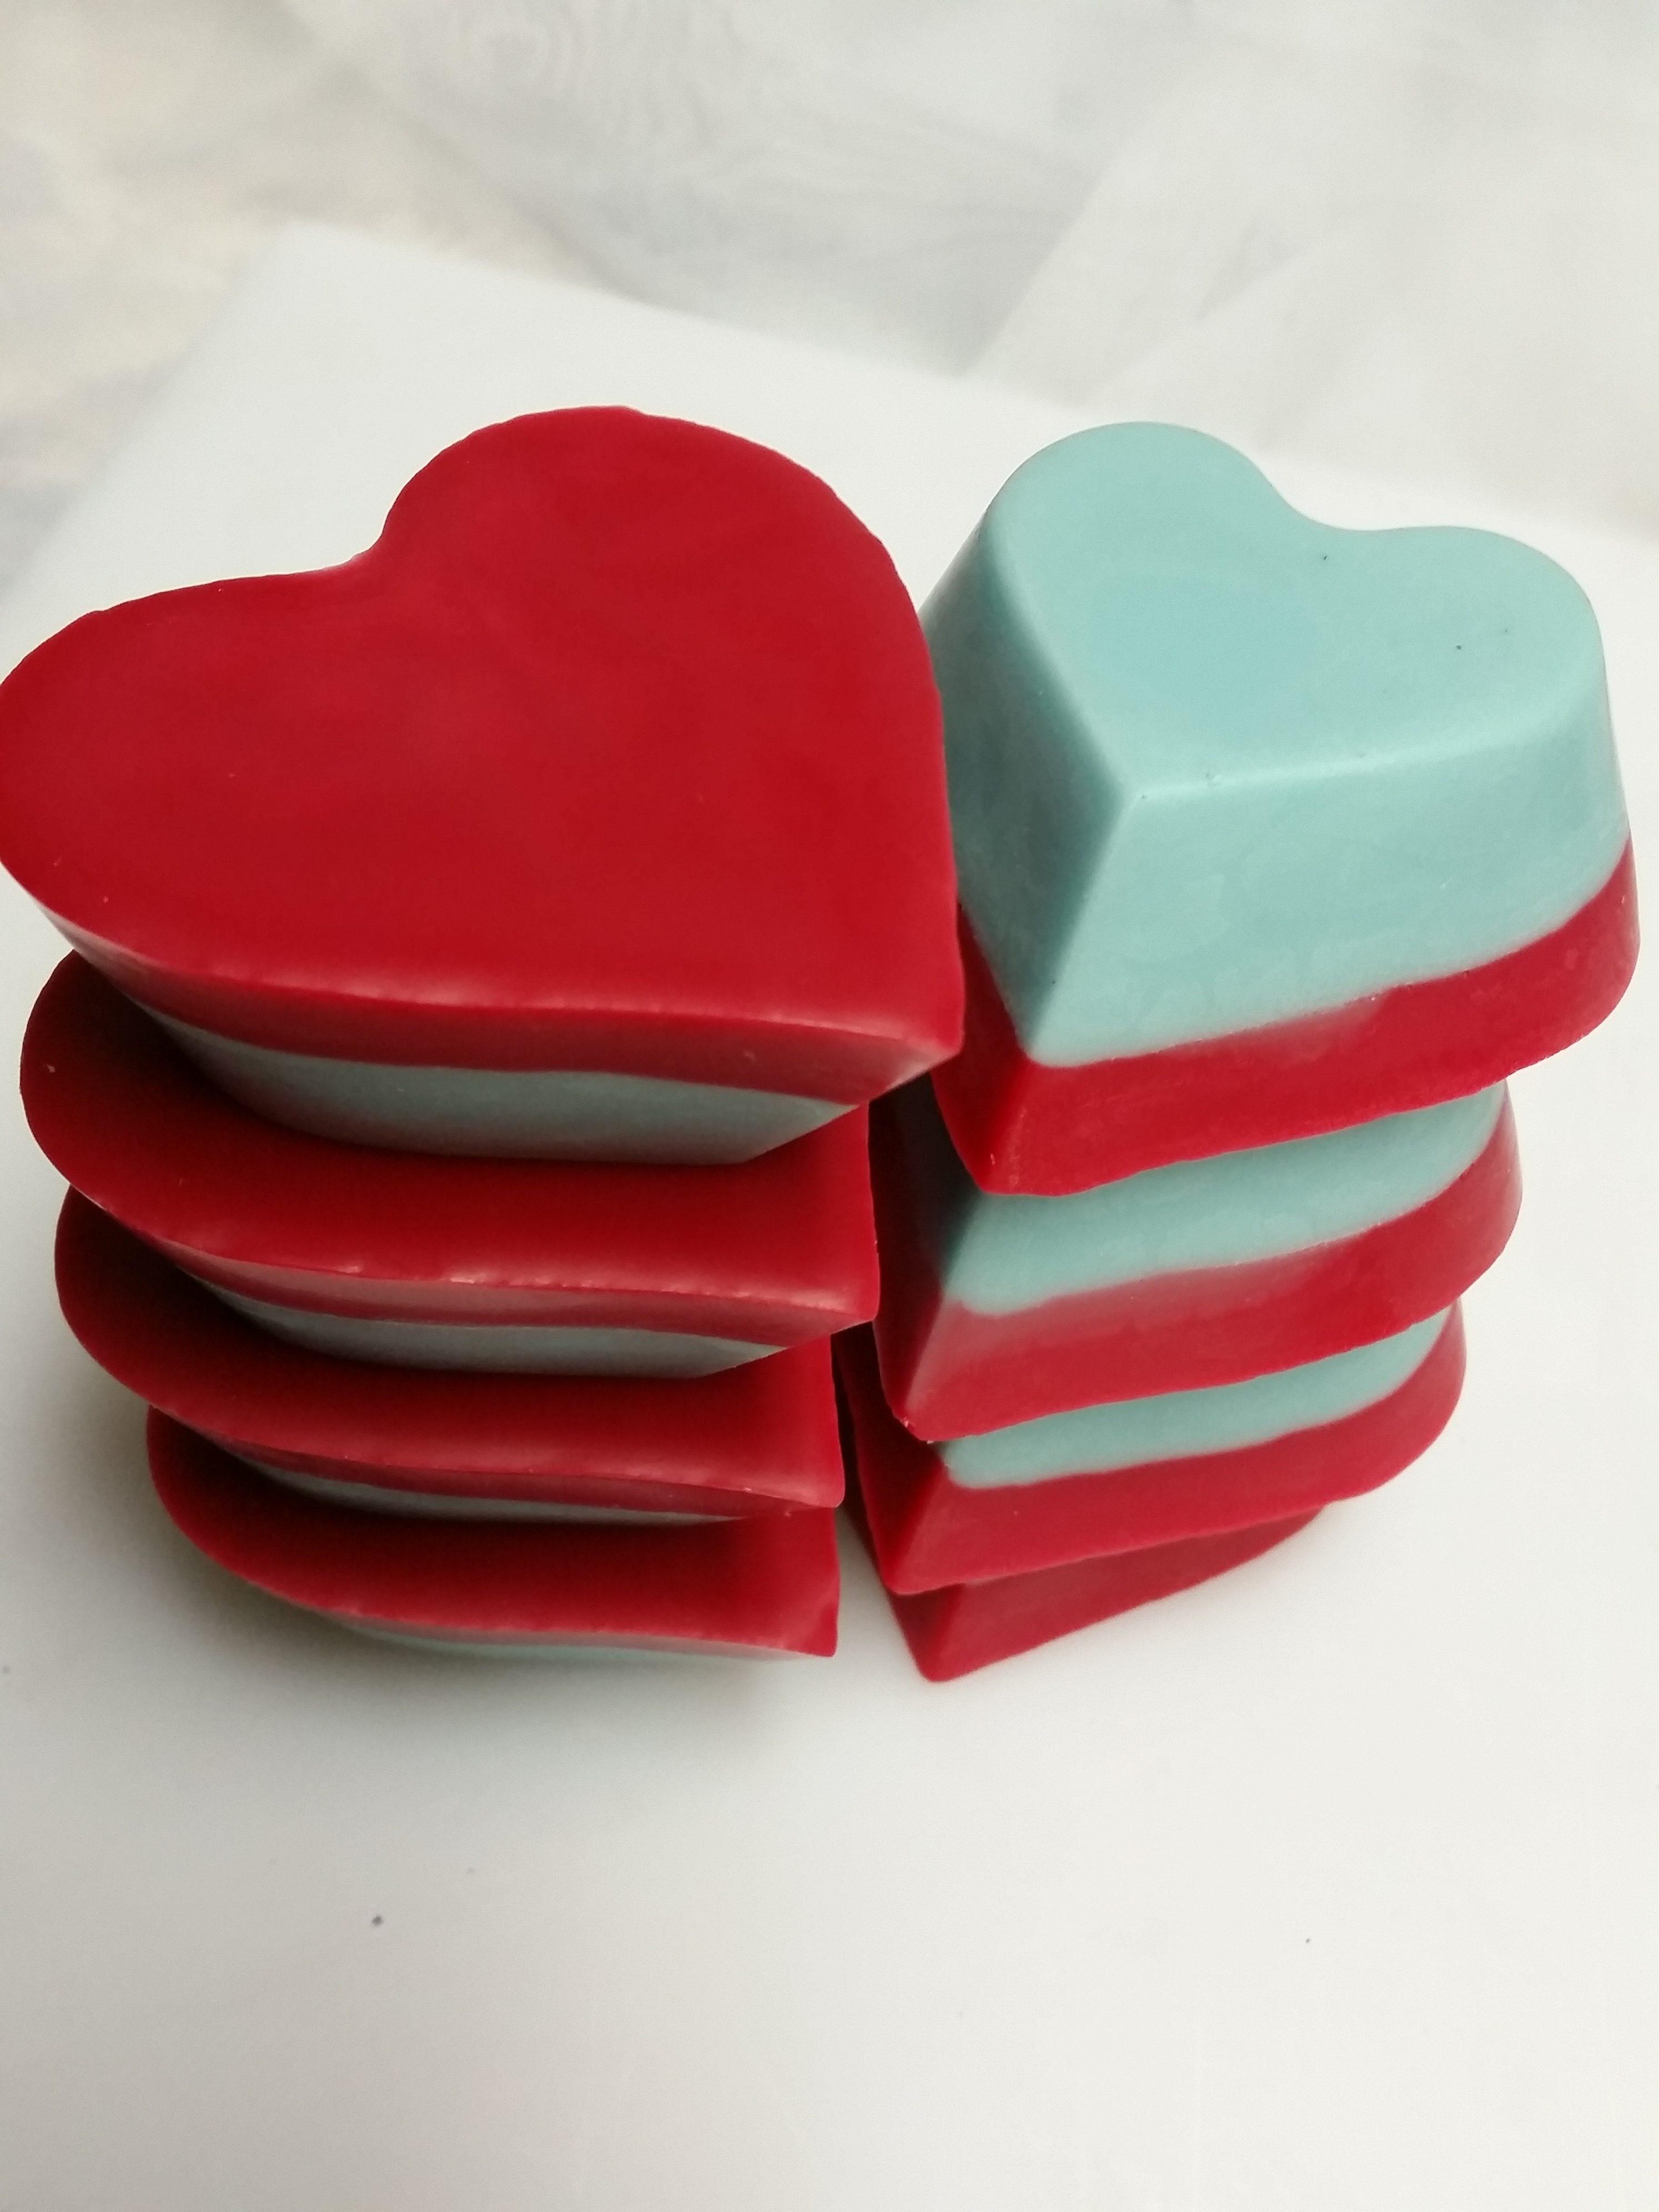 wax-layered-hearts-e1482609707705